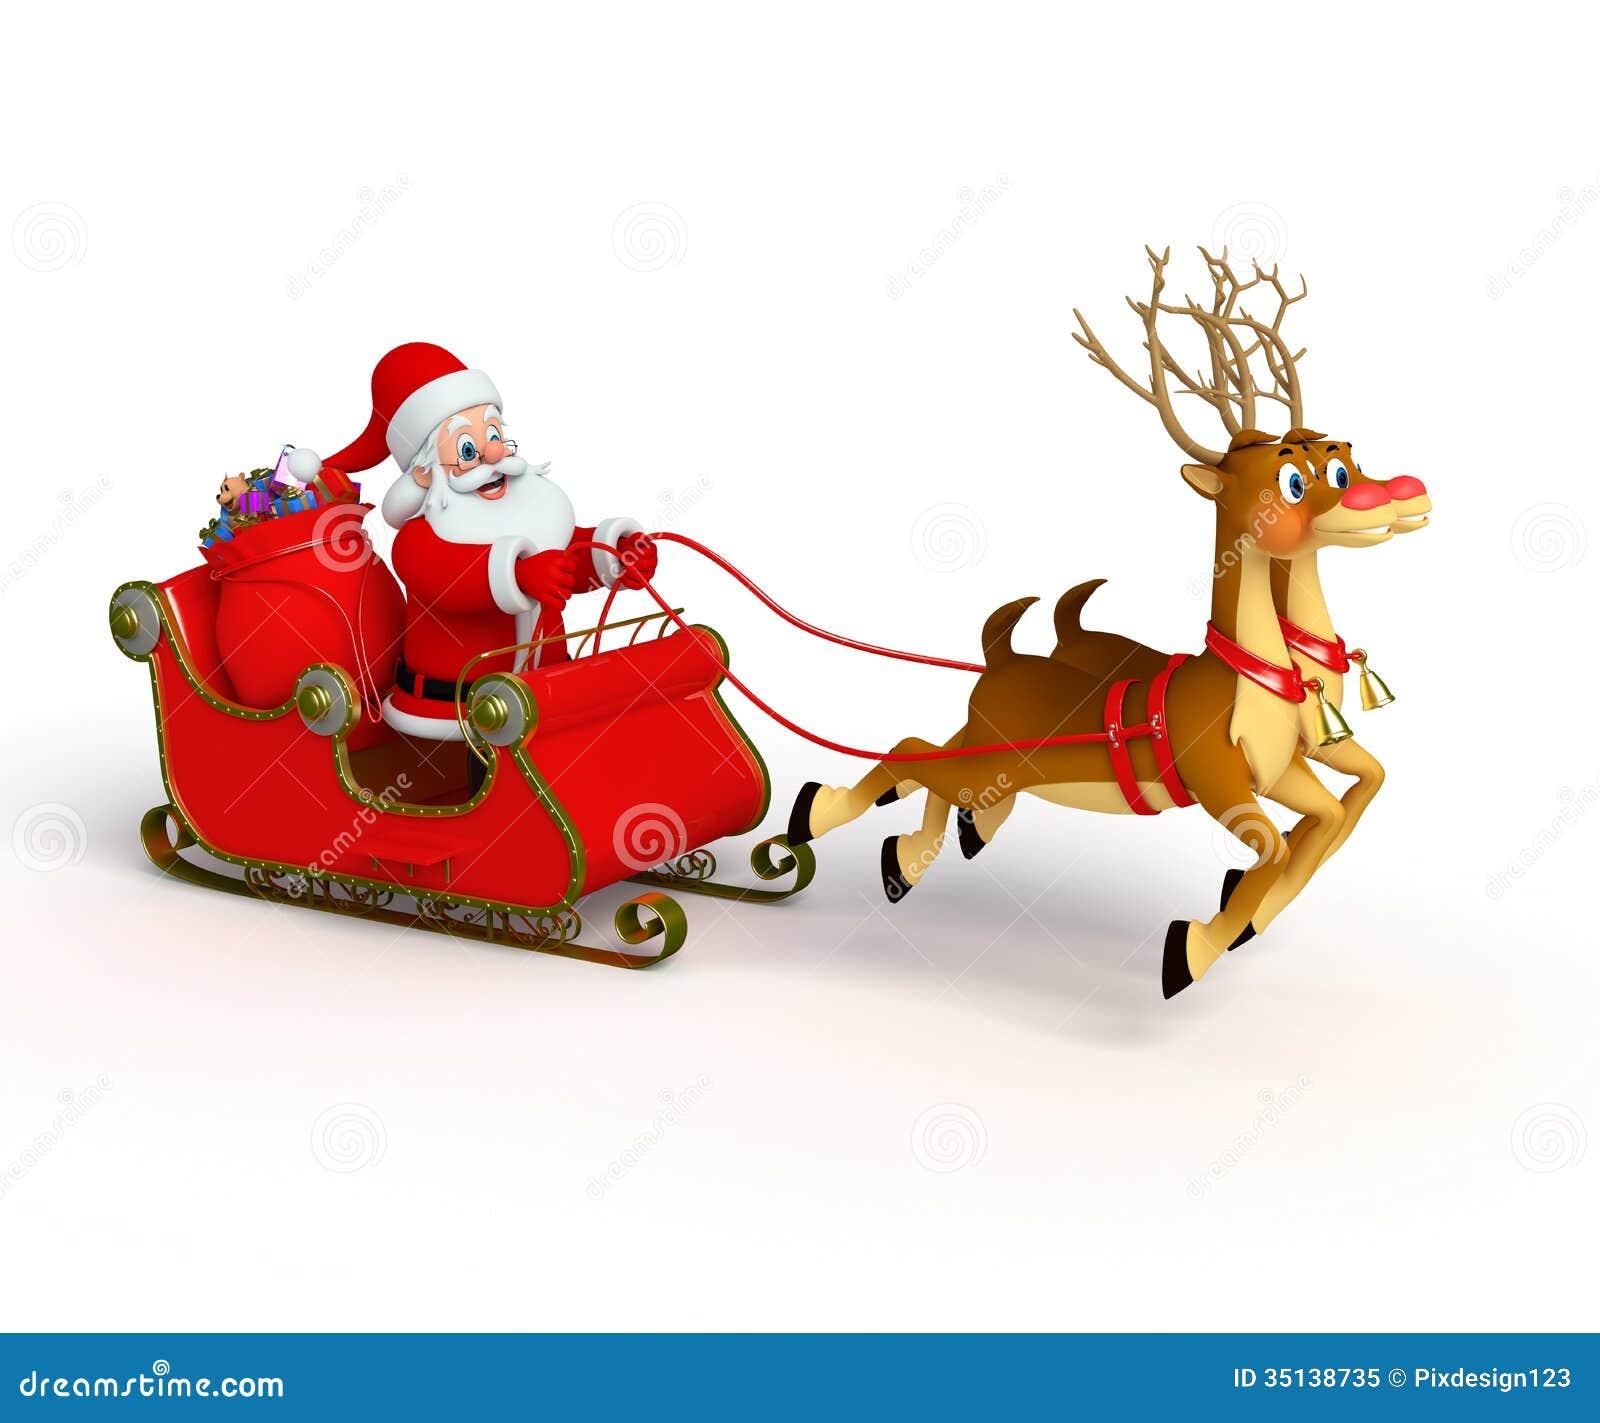 Picture of santas sleigh new calendar template site